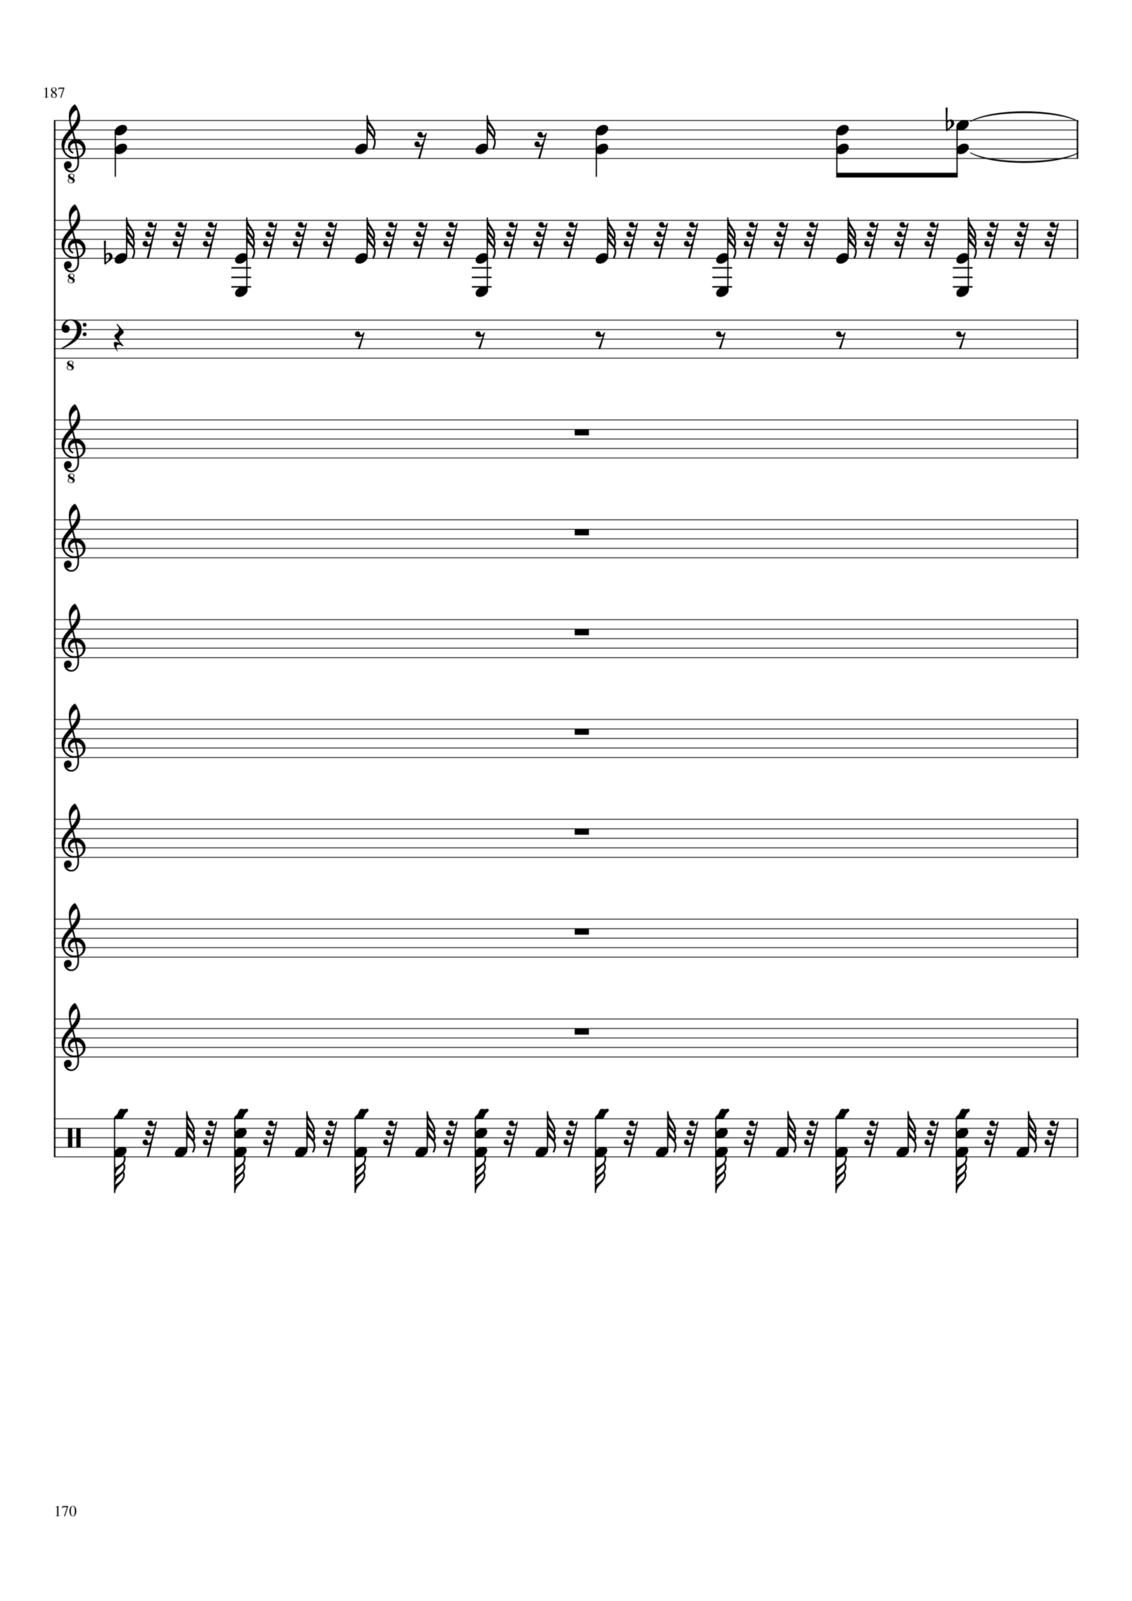 Belyiy sokol slide, Image 170